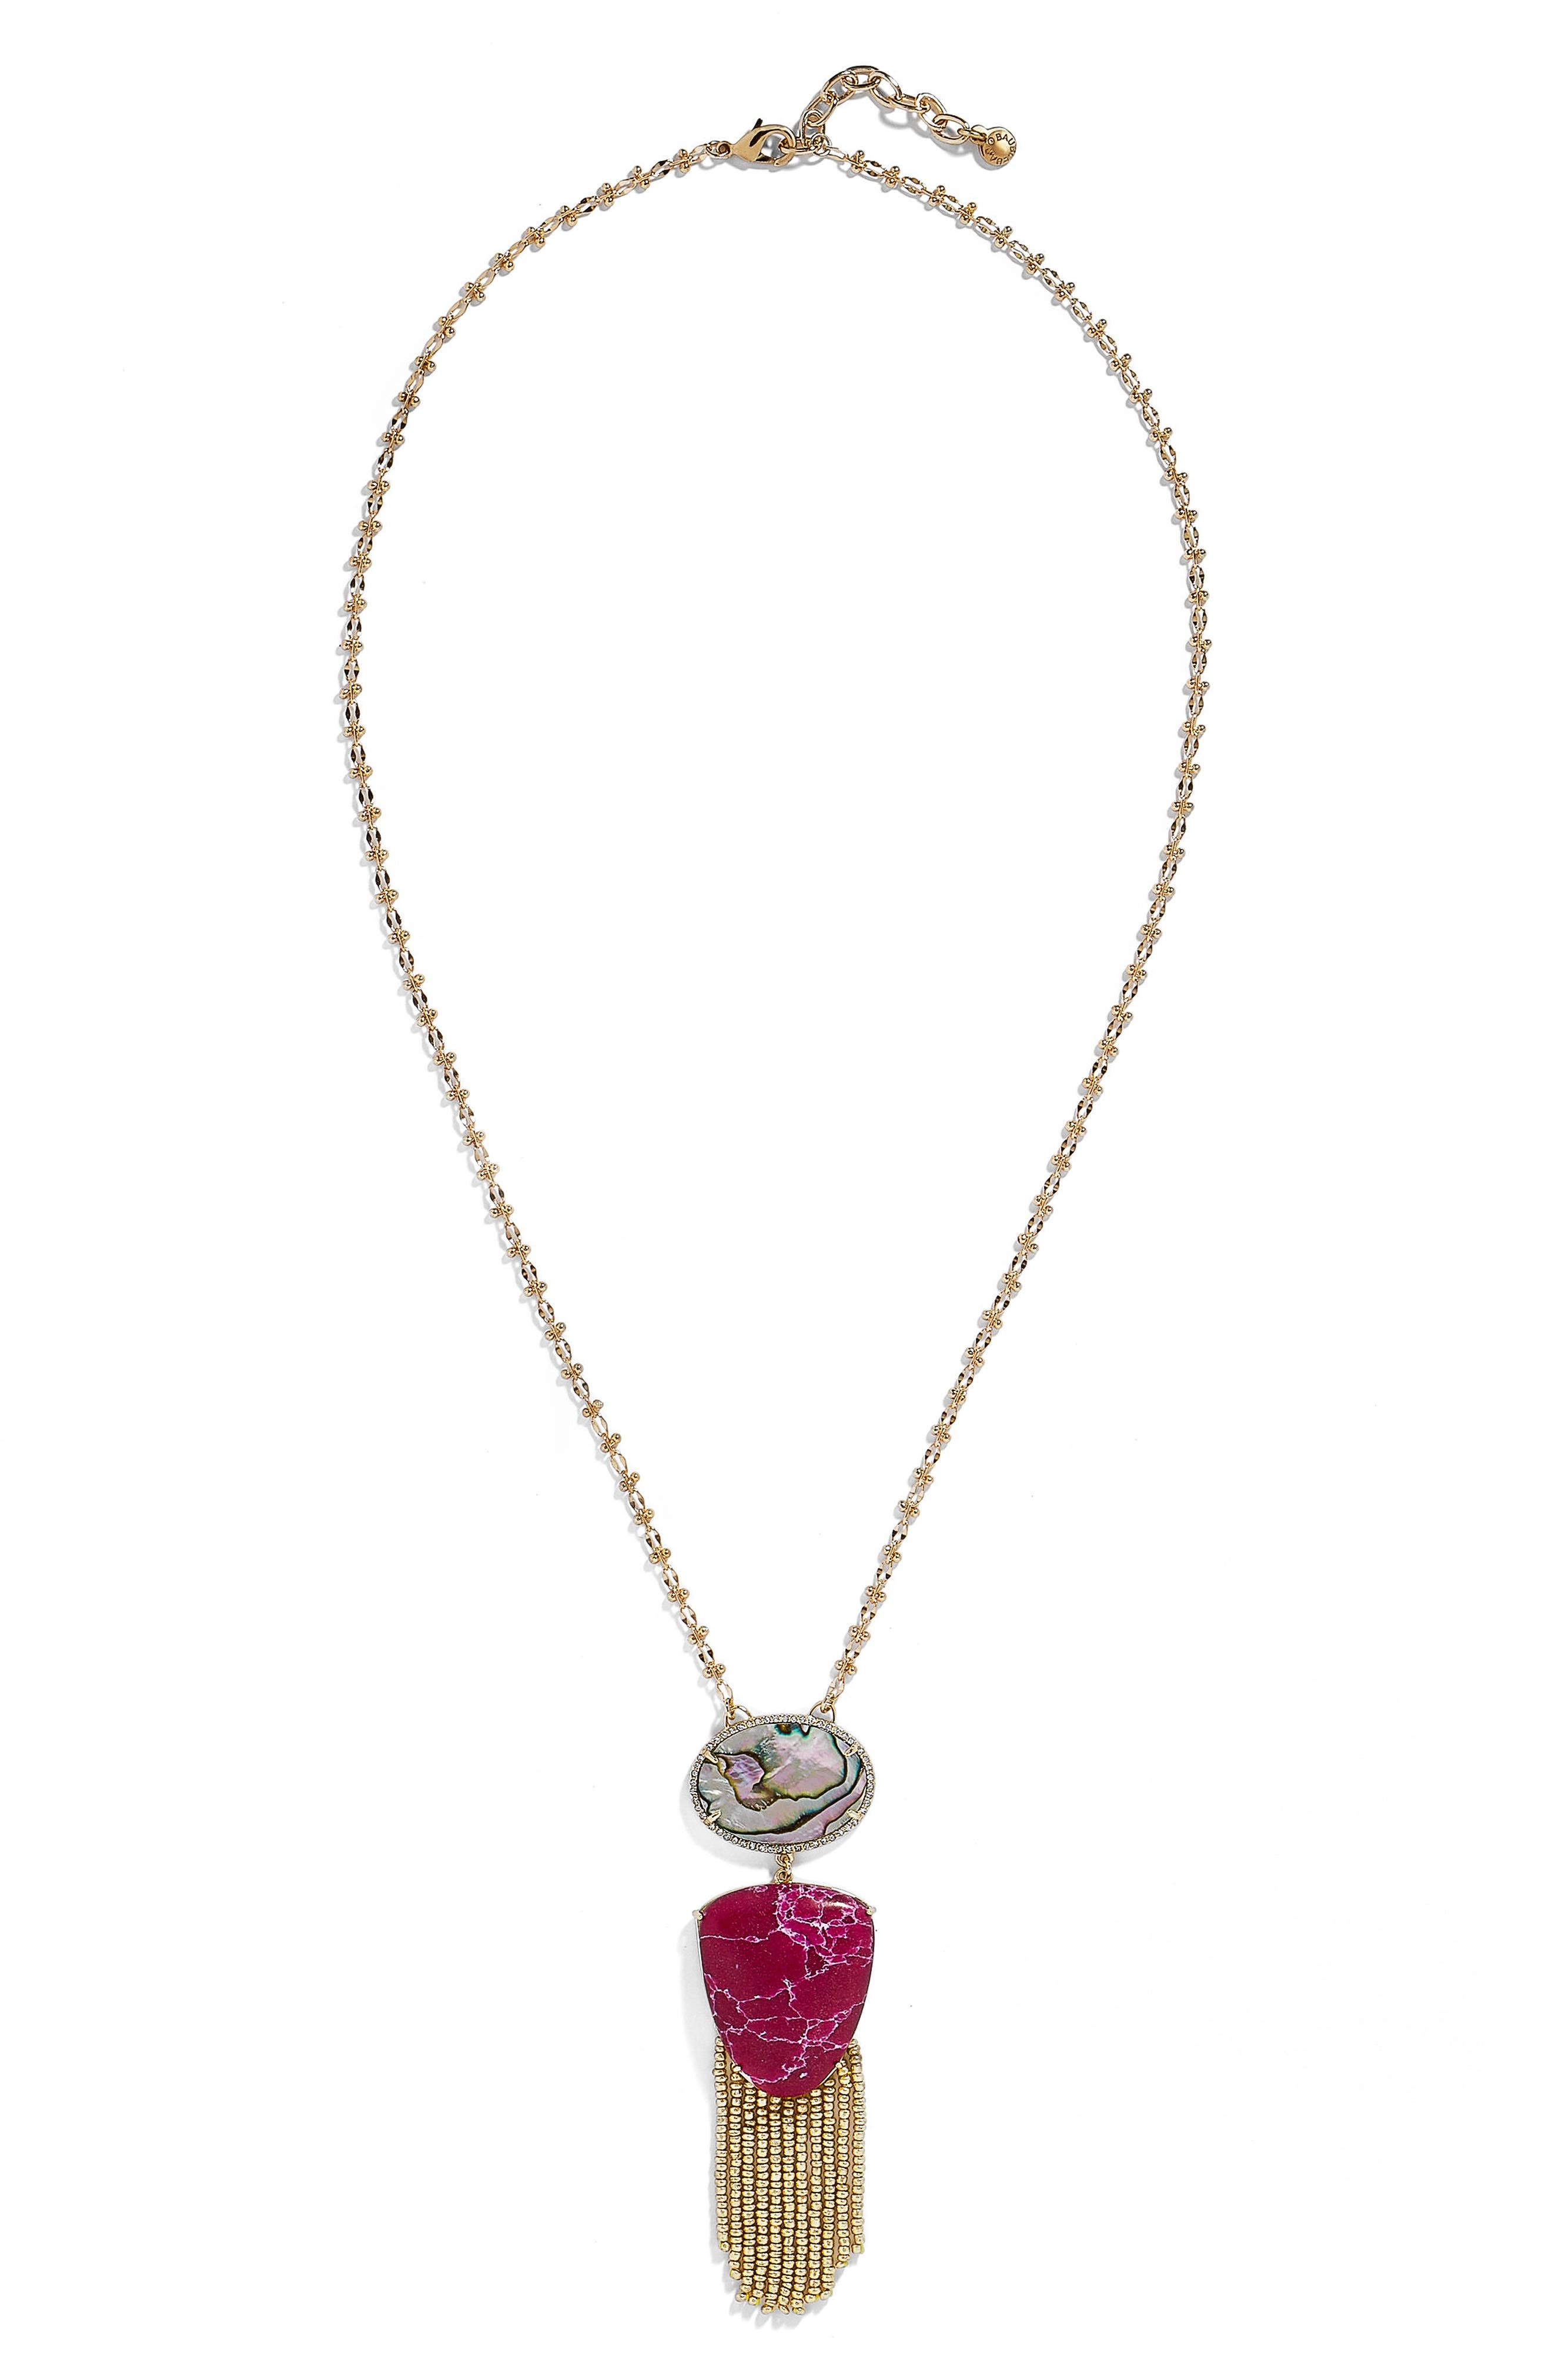 Alternate Image 1 Selected - BaubleBar Moonglow Fringe Abalone Pendant Necklace